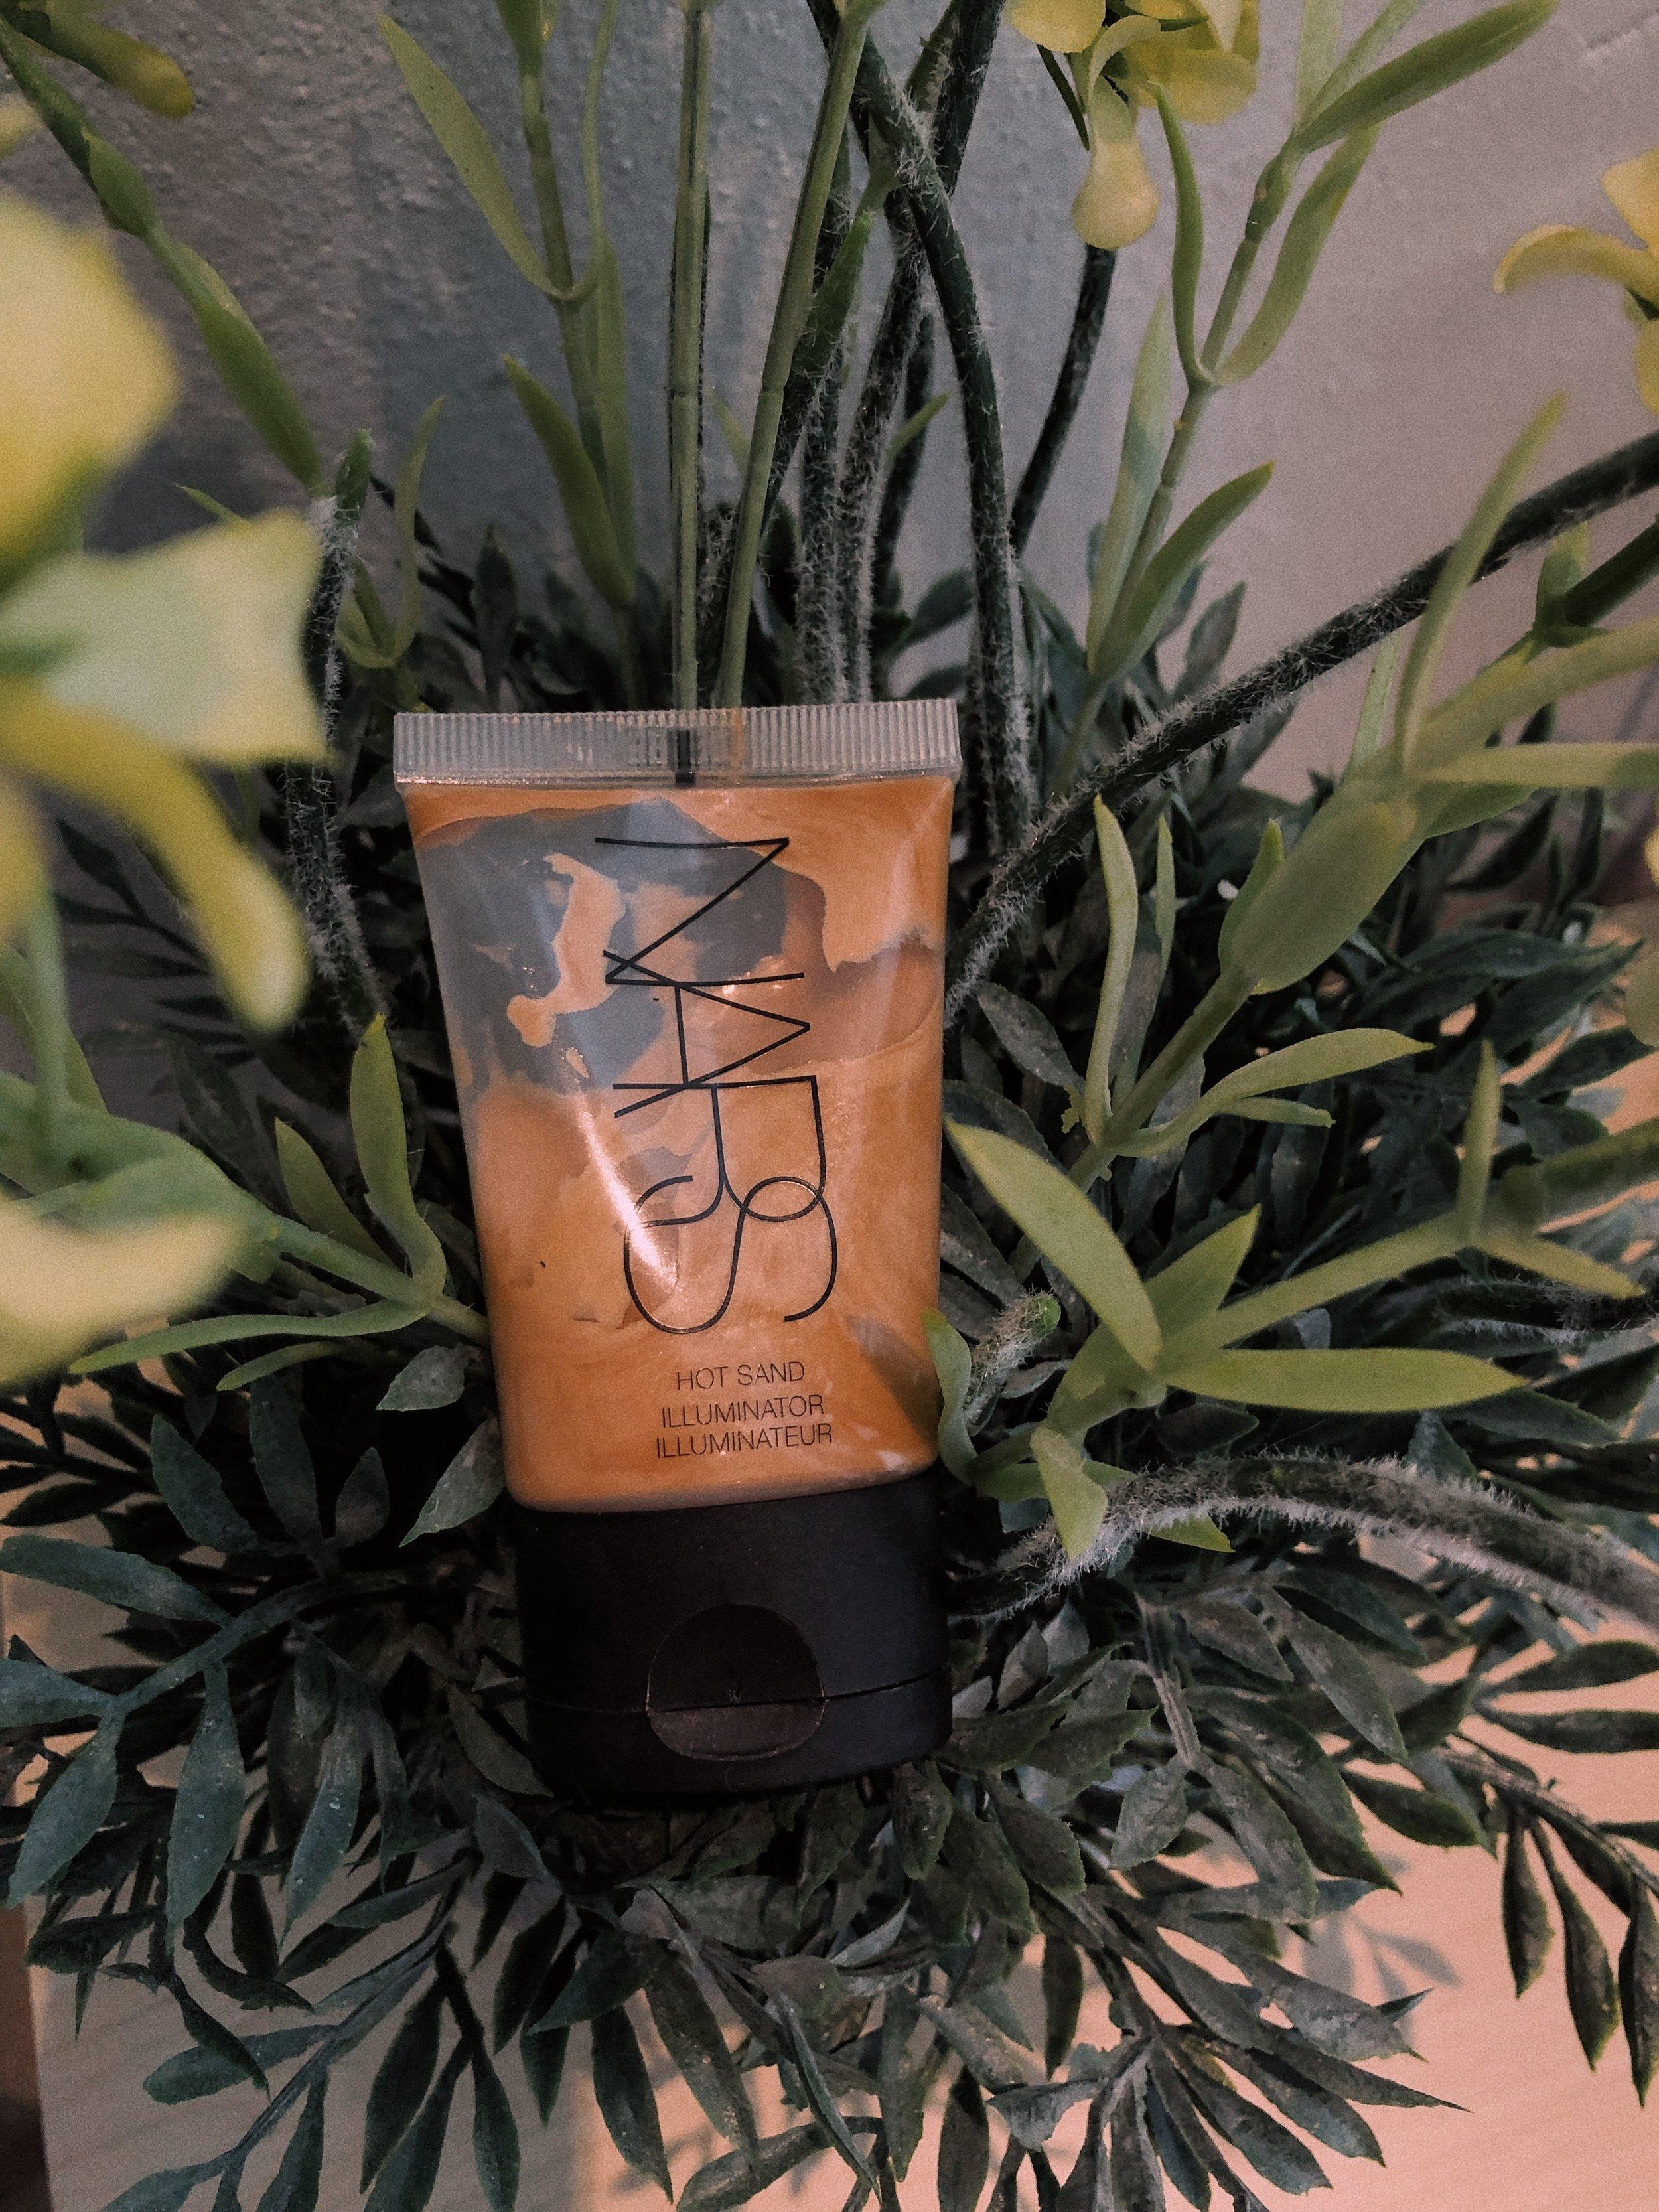 NARS Hot Sand Illuminator Review - Amour Ophelia